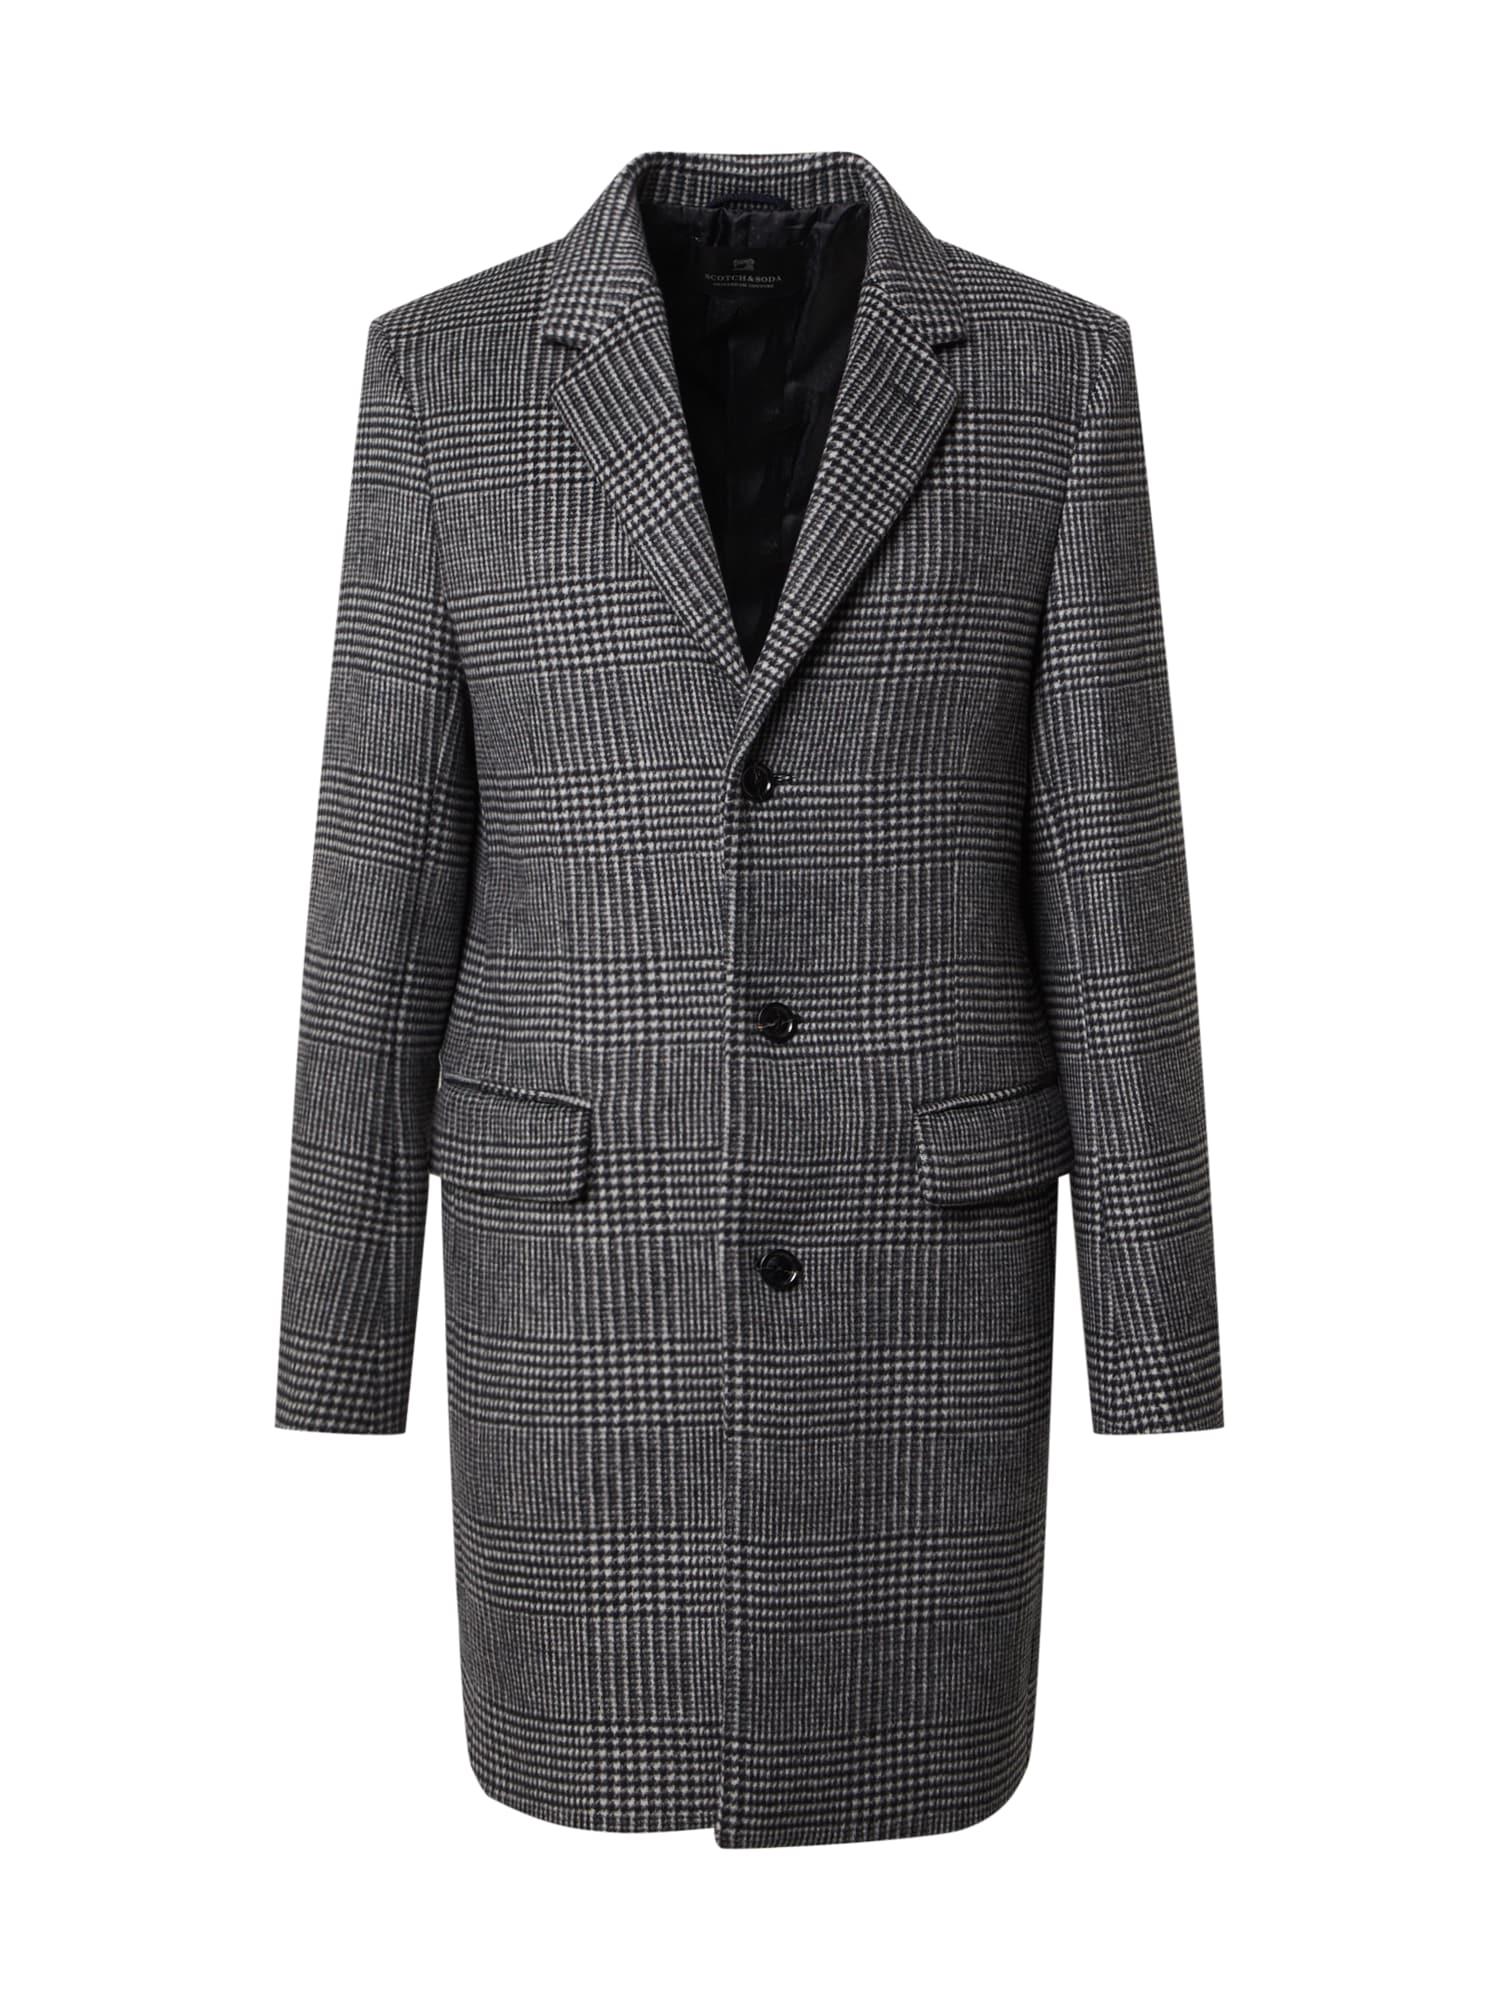 SCOTCH & SODA Demisezoninis paltas tamsiai pilka / balta / juoda